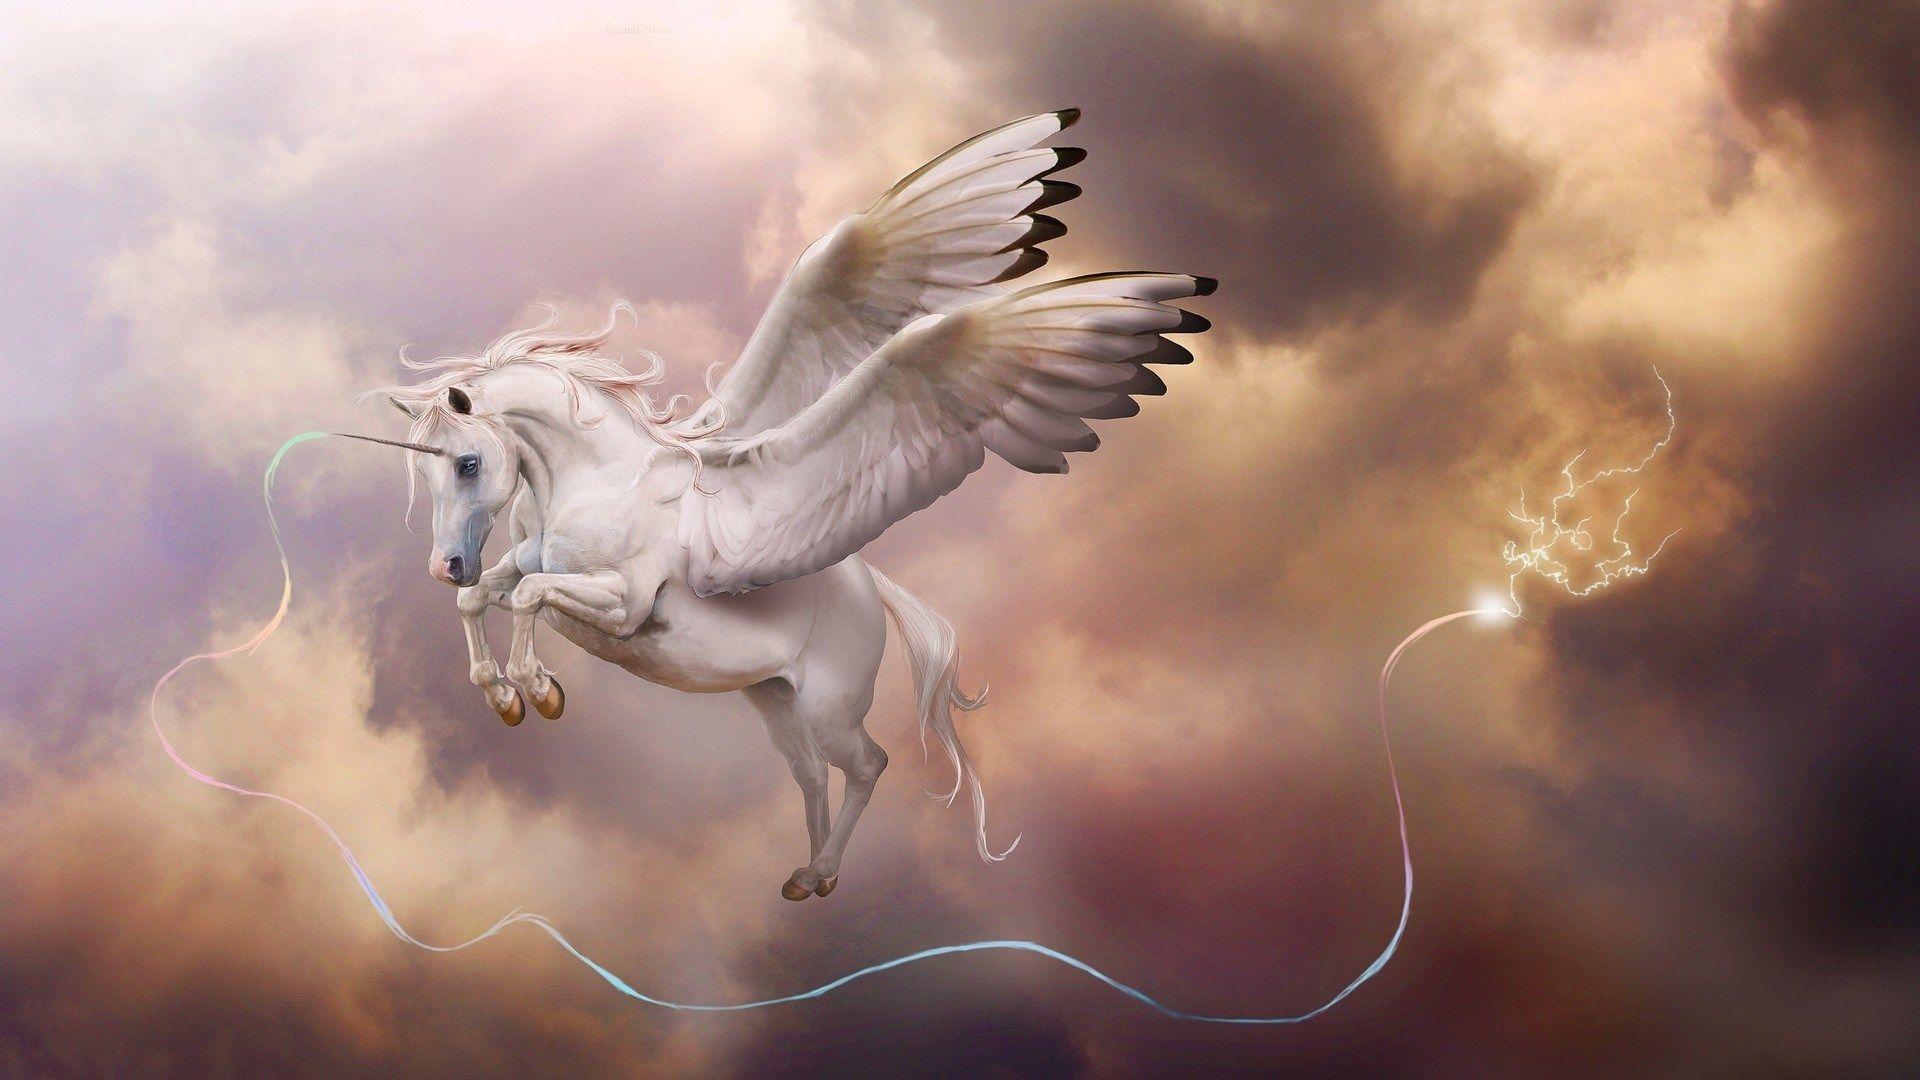 fantasy unicorn hd wallpapers 1920x1080 1